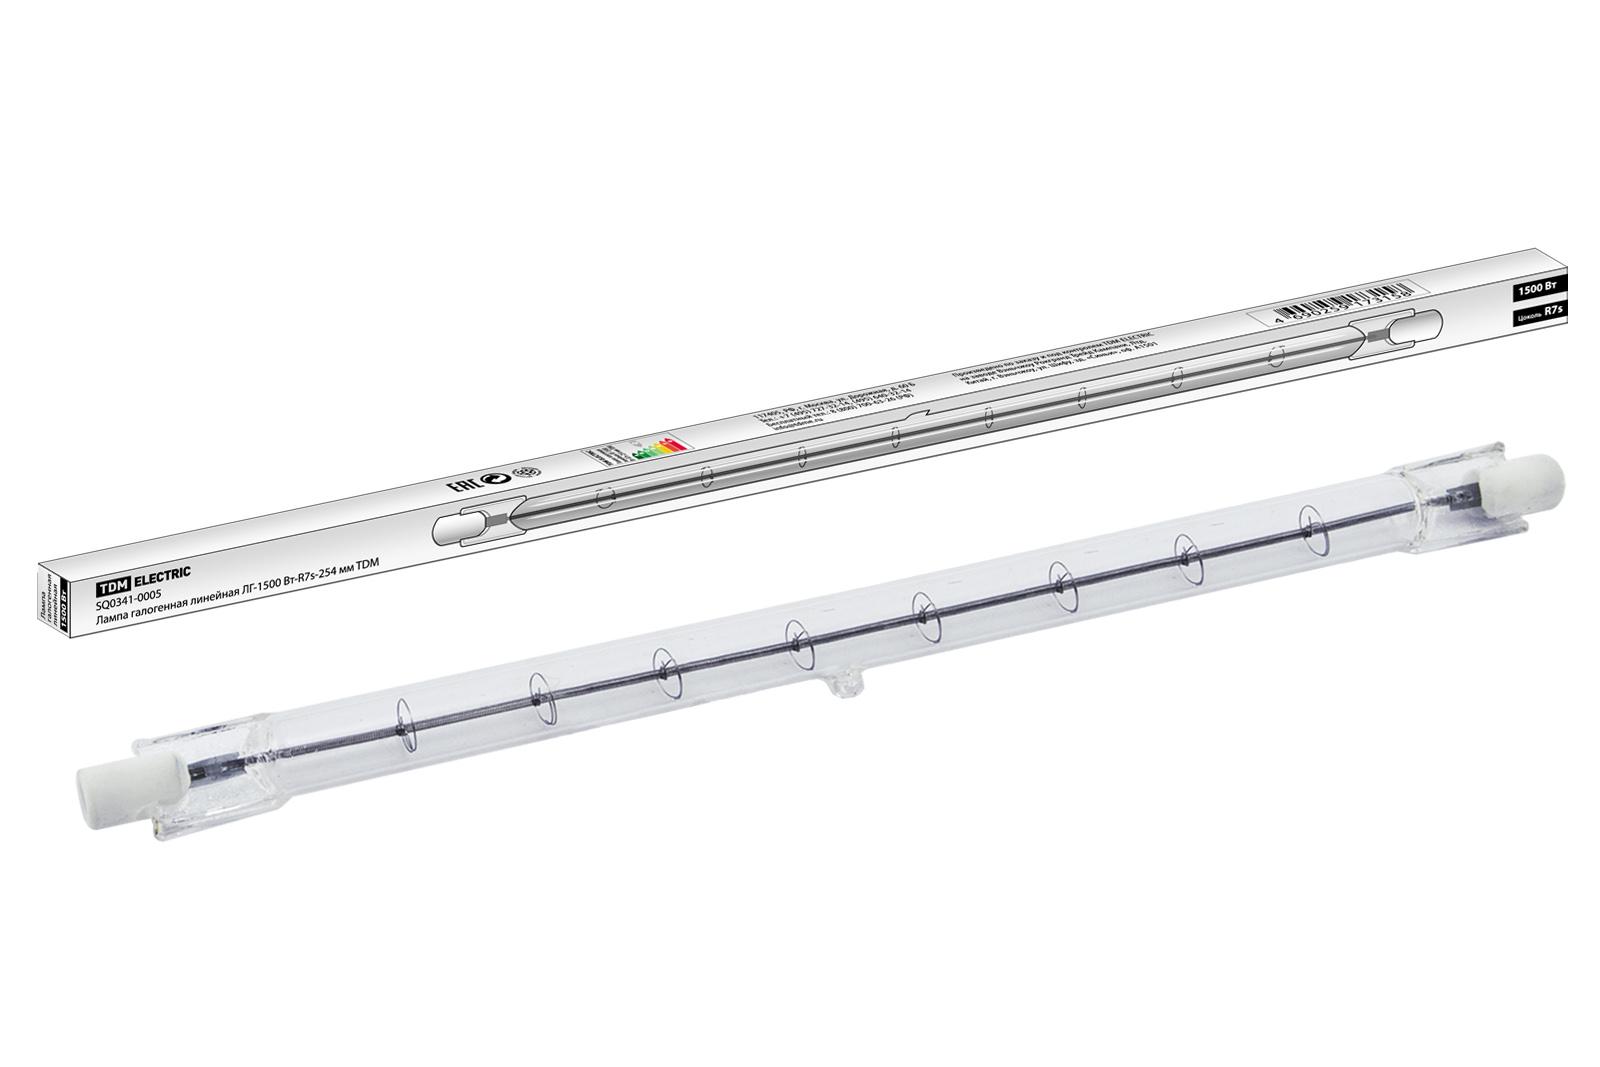 Фото Лампа галогенная линейная ЛГ-1500 Вт-R7s-254 мм TDM {SQ0341-0005}